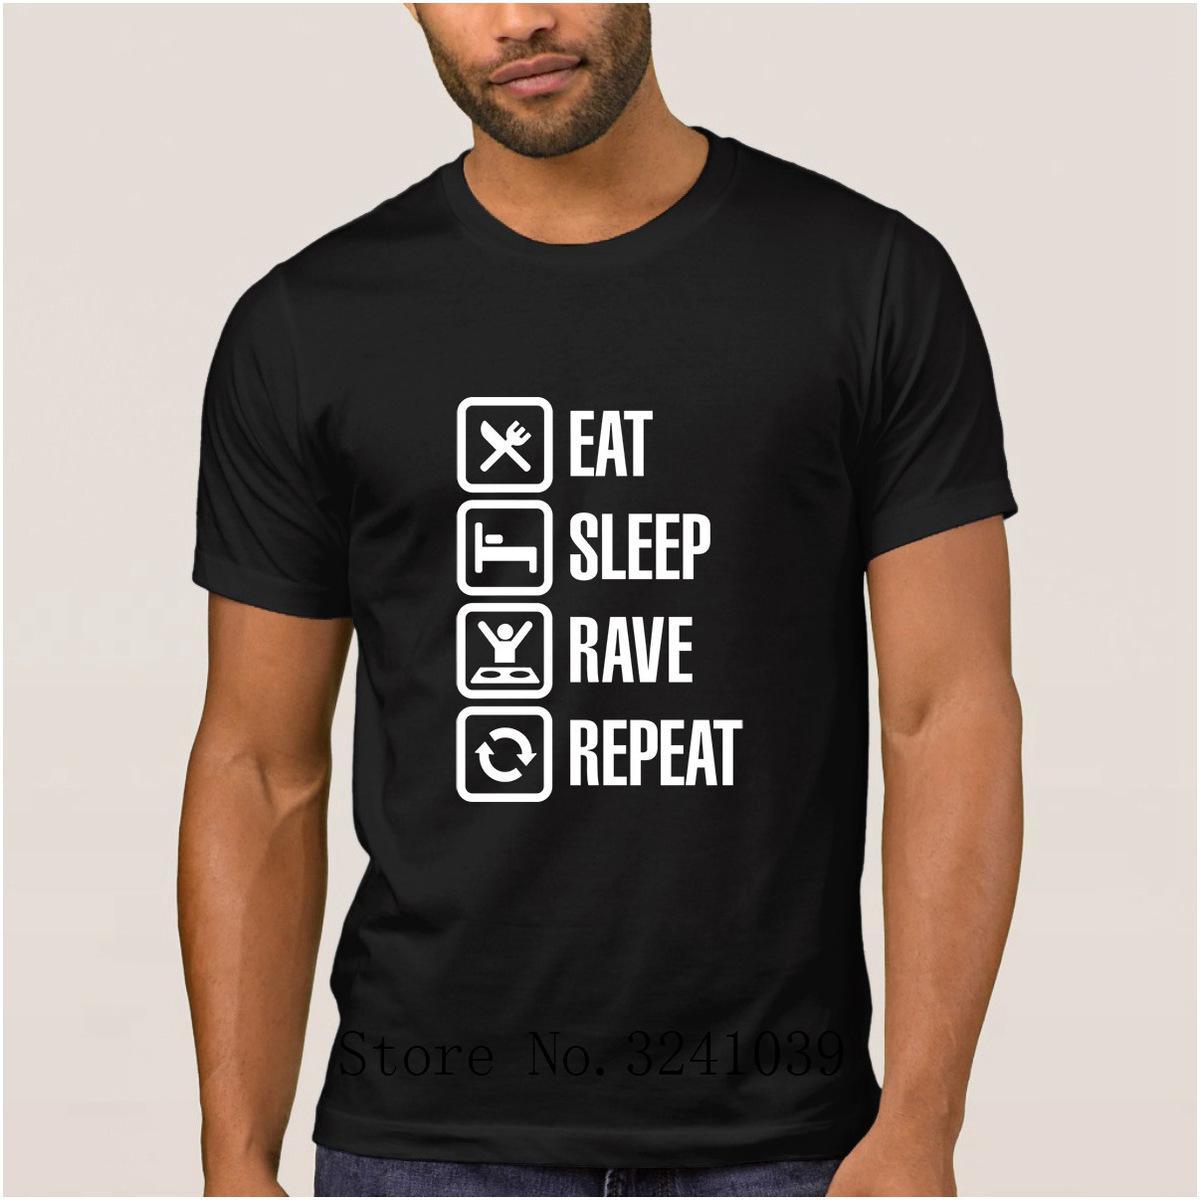 La Maxpa Character fashion eat sleep rave repeat men t shirt summer Free Shipping t-shirt Leisure tee shirt Short Sleeve hip hop